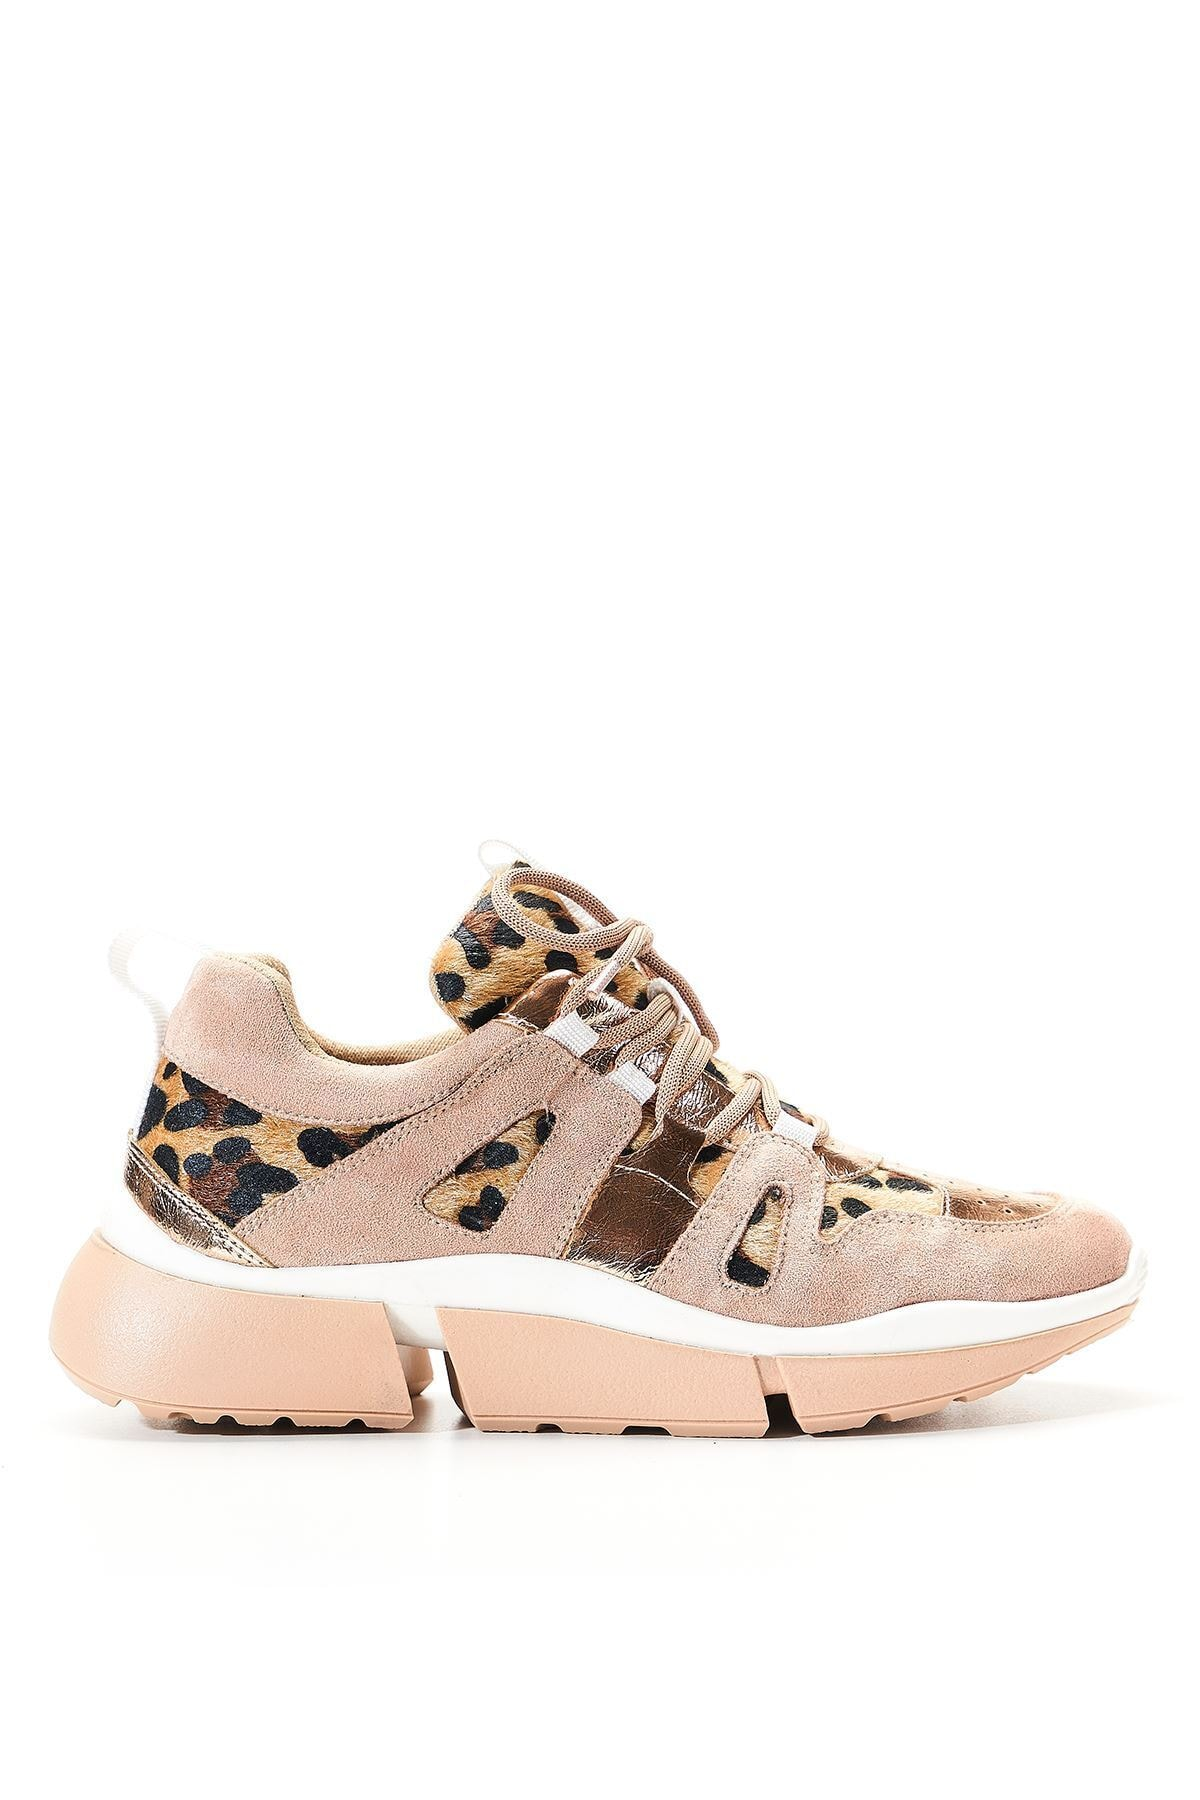 Louis Cardy Savannah Bej Kadın Sneakers